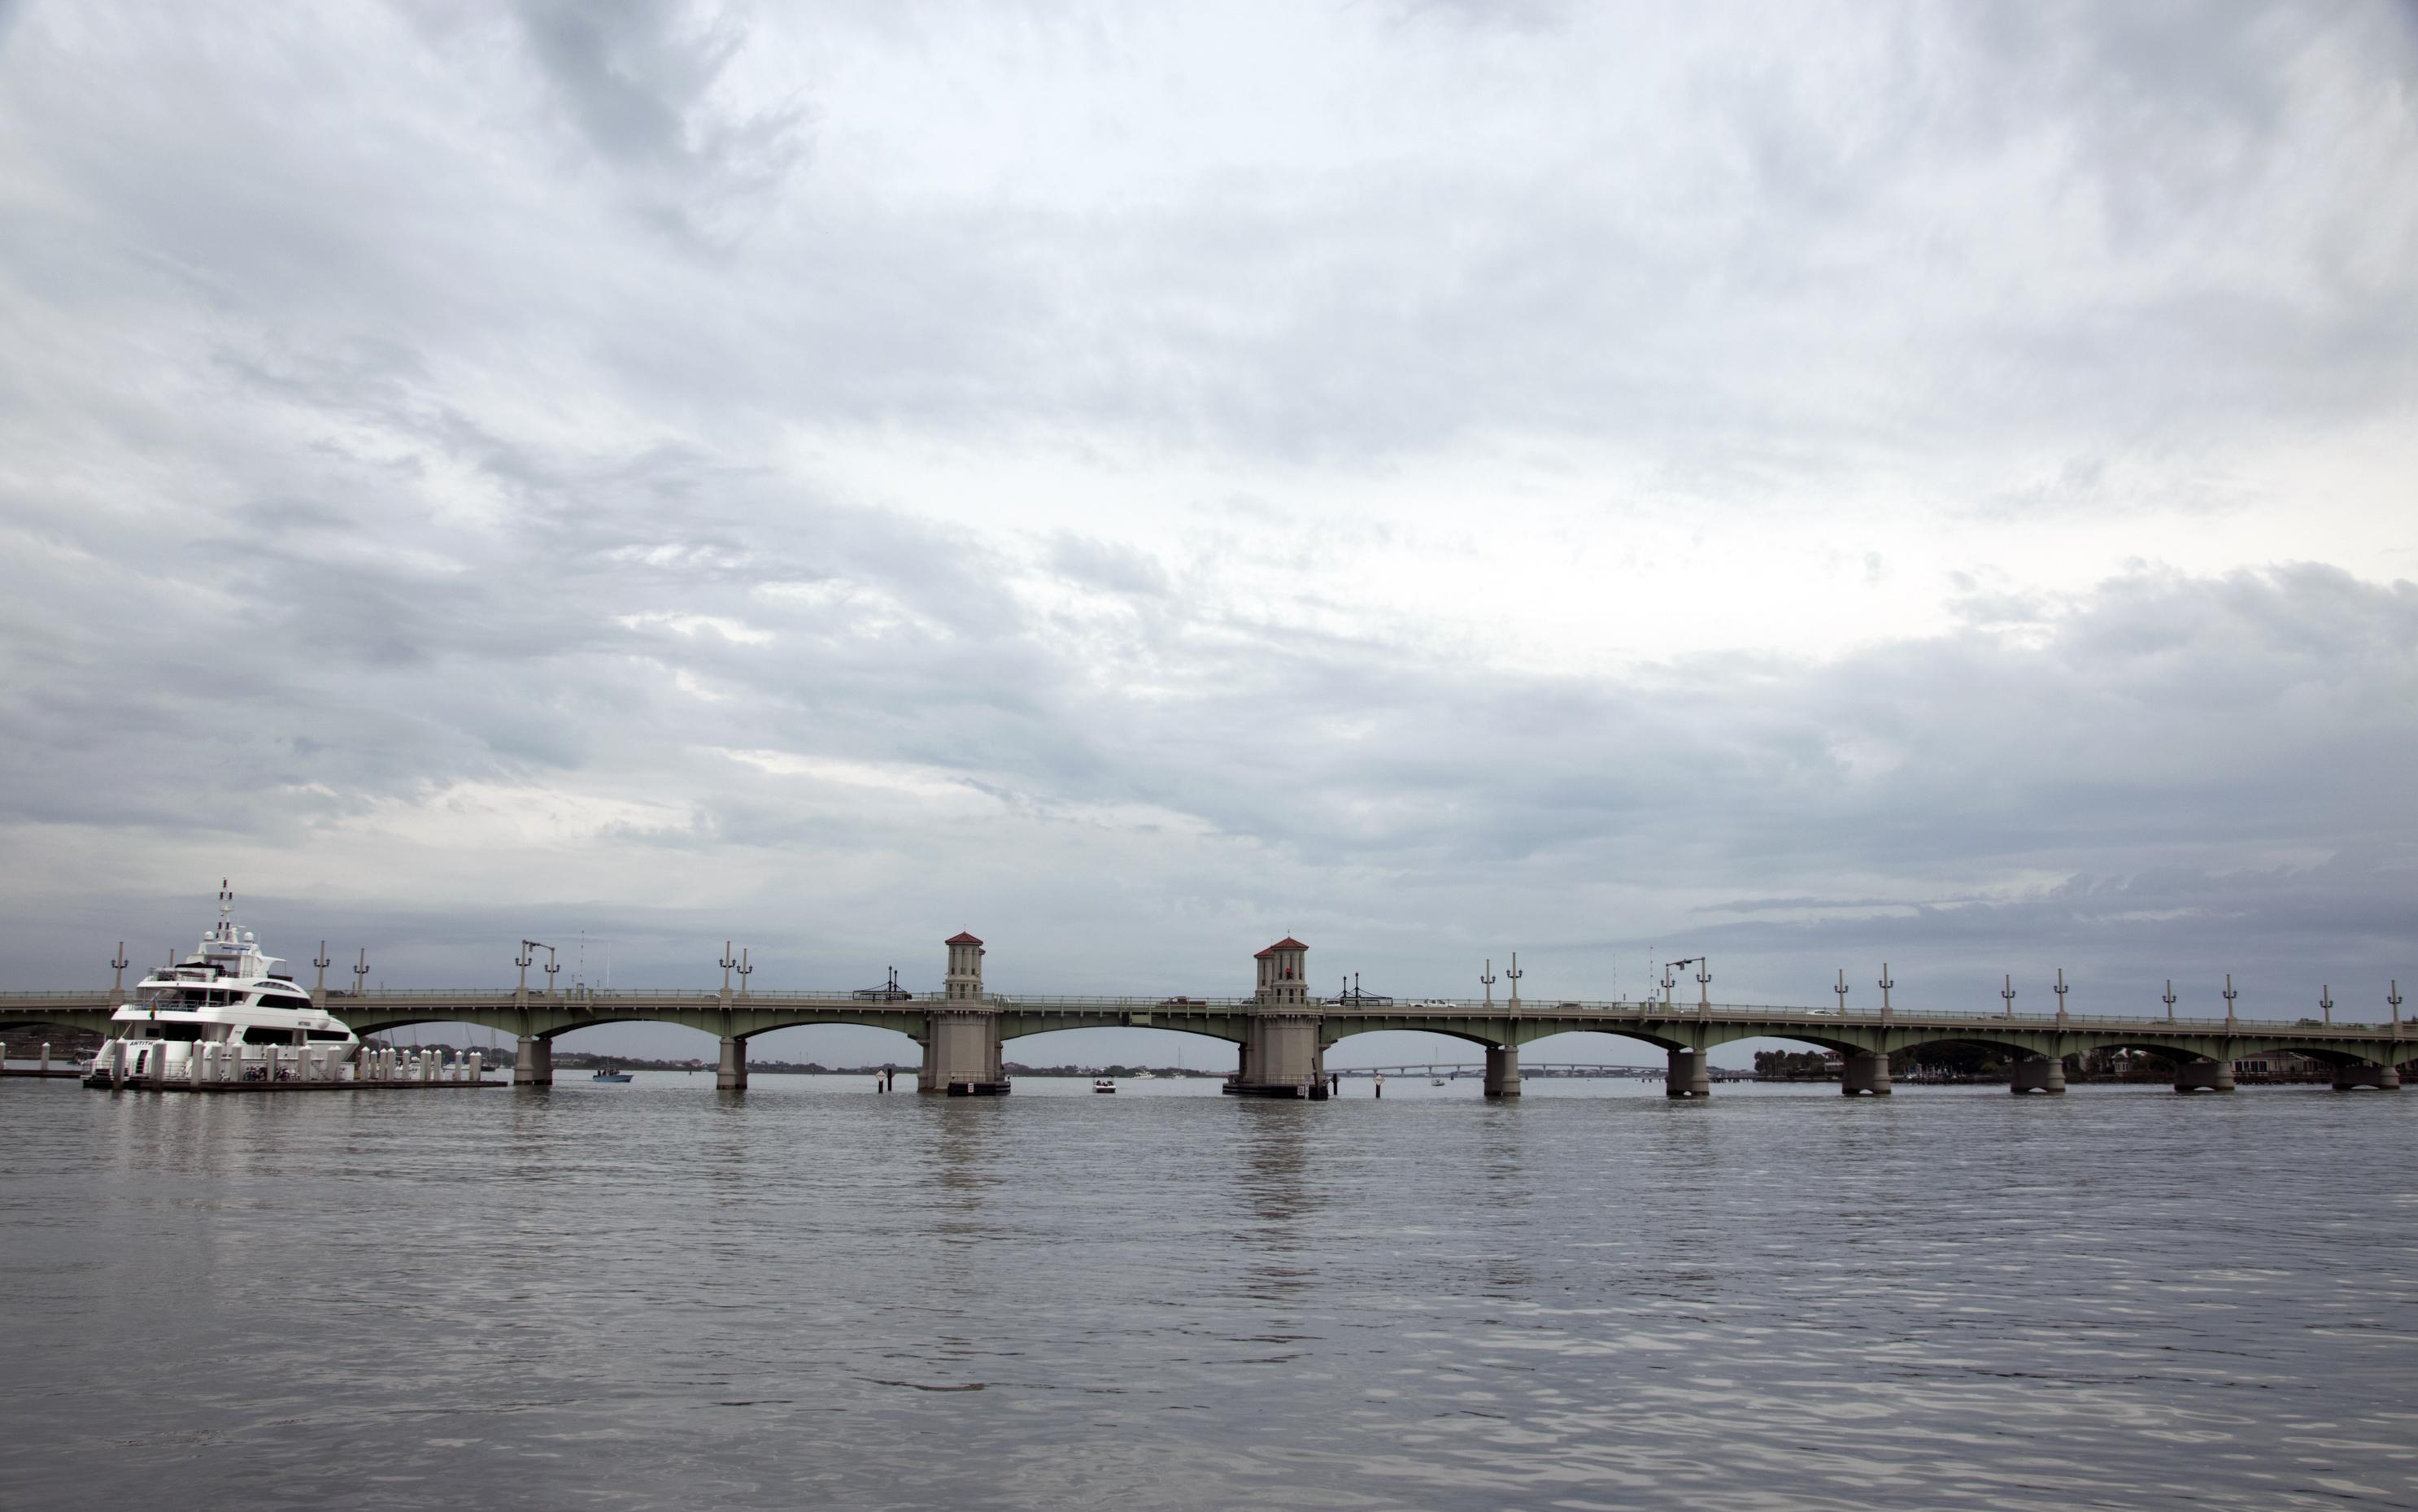 st. augustine yacht lions bridge